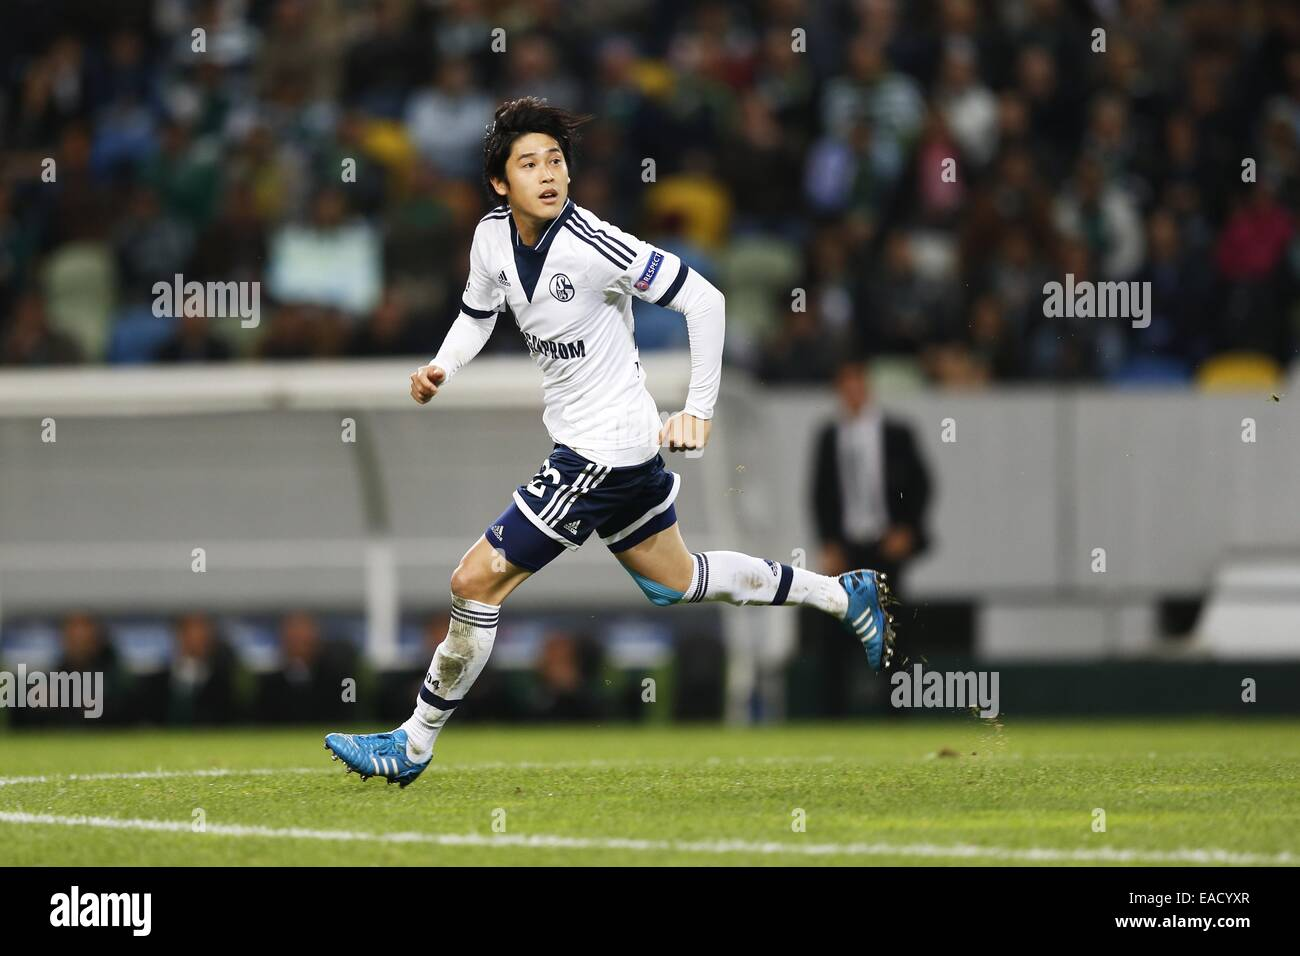 Lissabon, Portugal. 5. November 2014. Atsuto Uchida (Schalke) Fußball: UEFA Champions League-Gruppe G-match zwischen Stockfoto